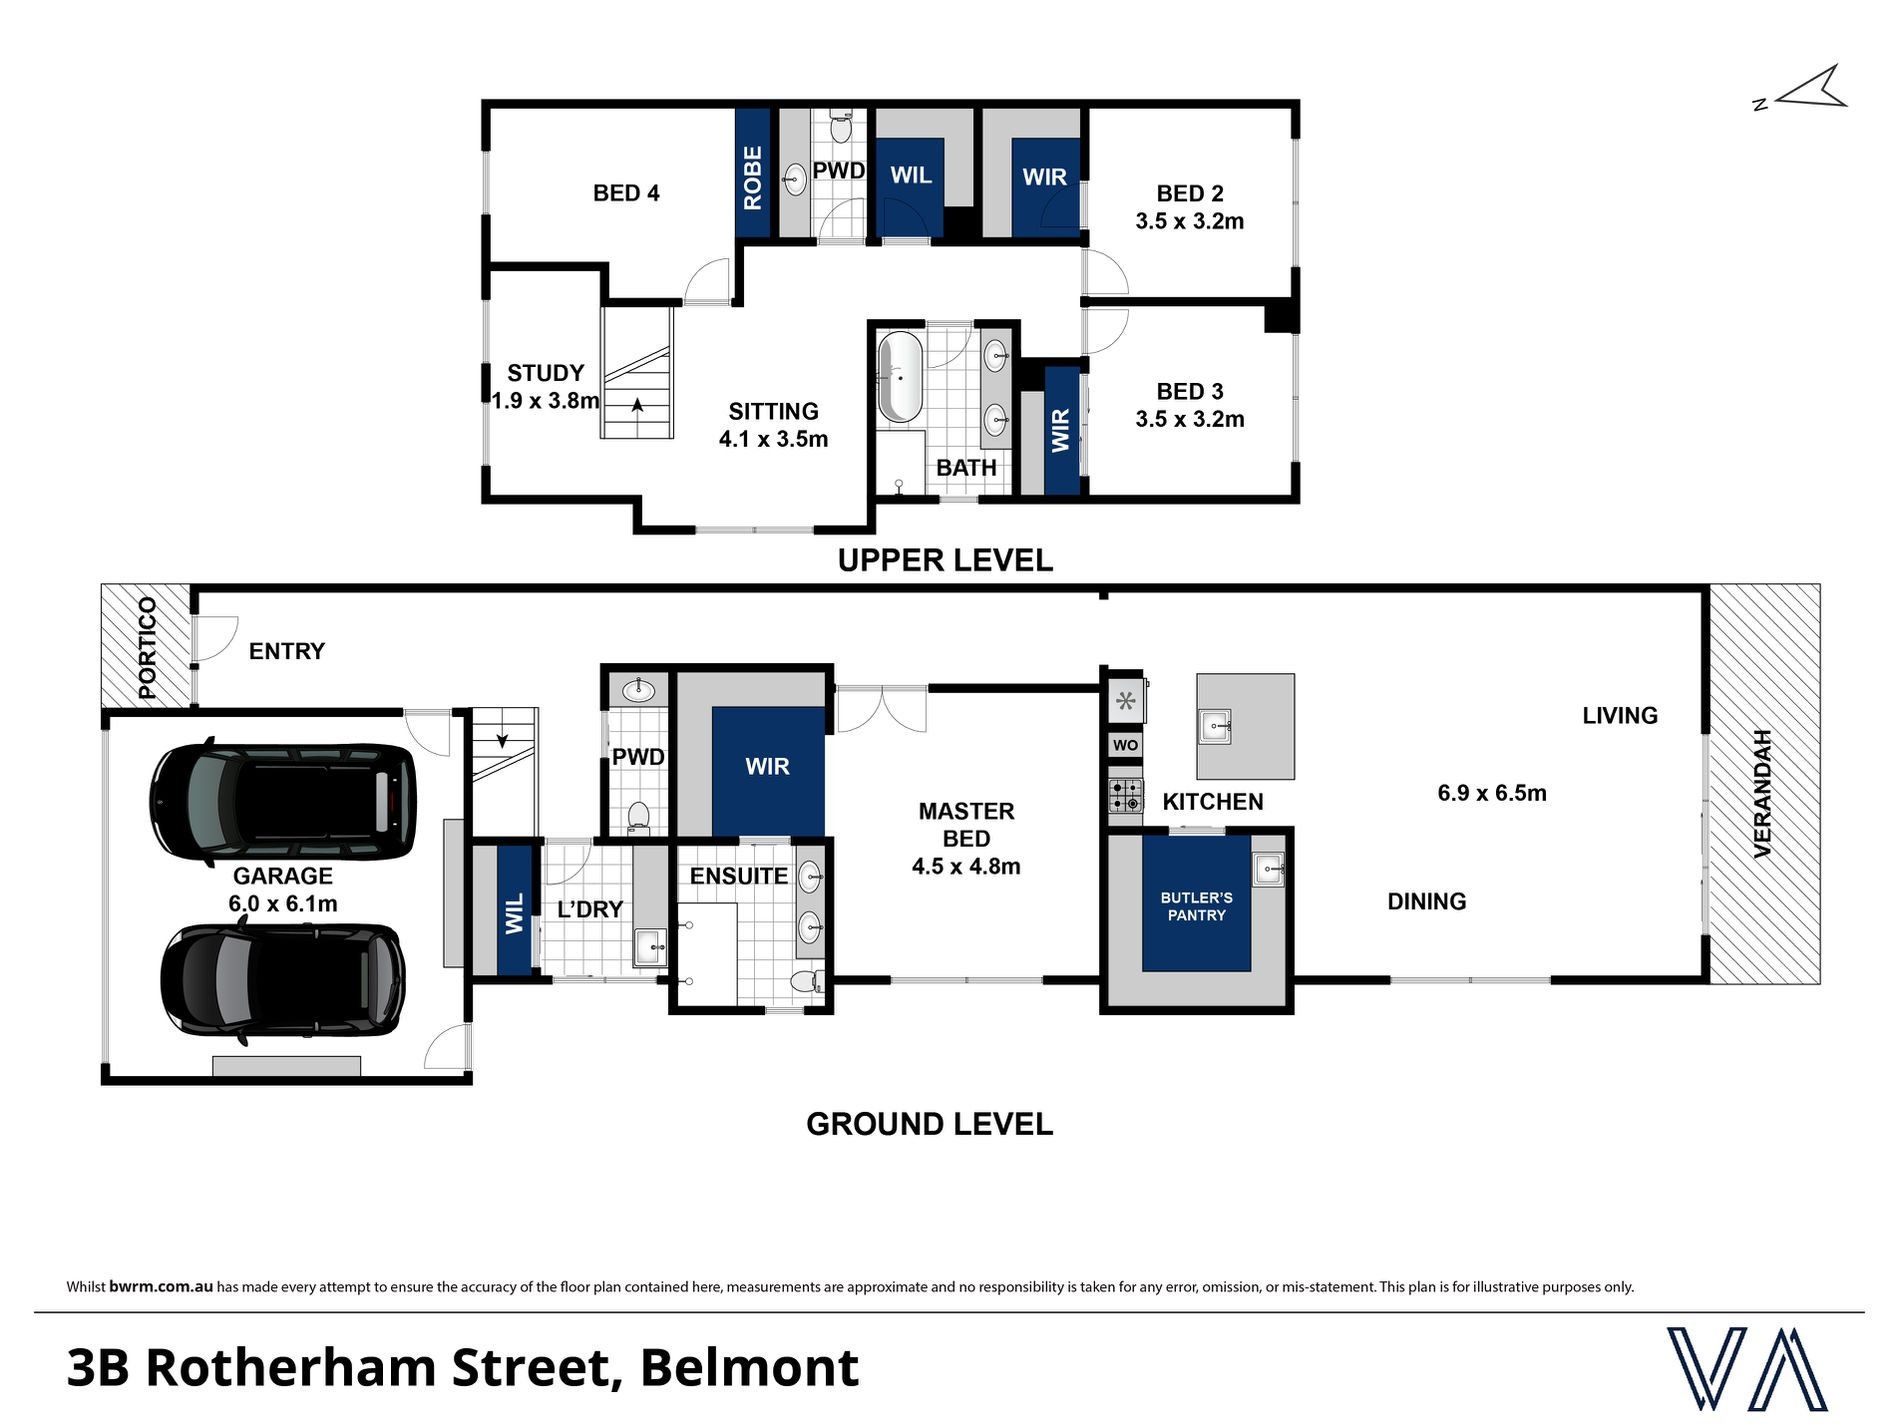 3B Rotherham Street, Belmont